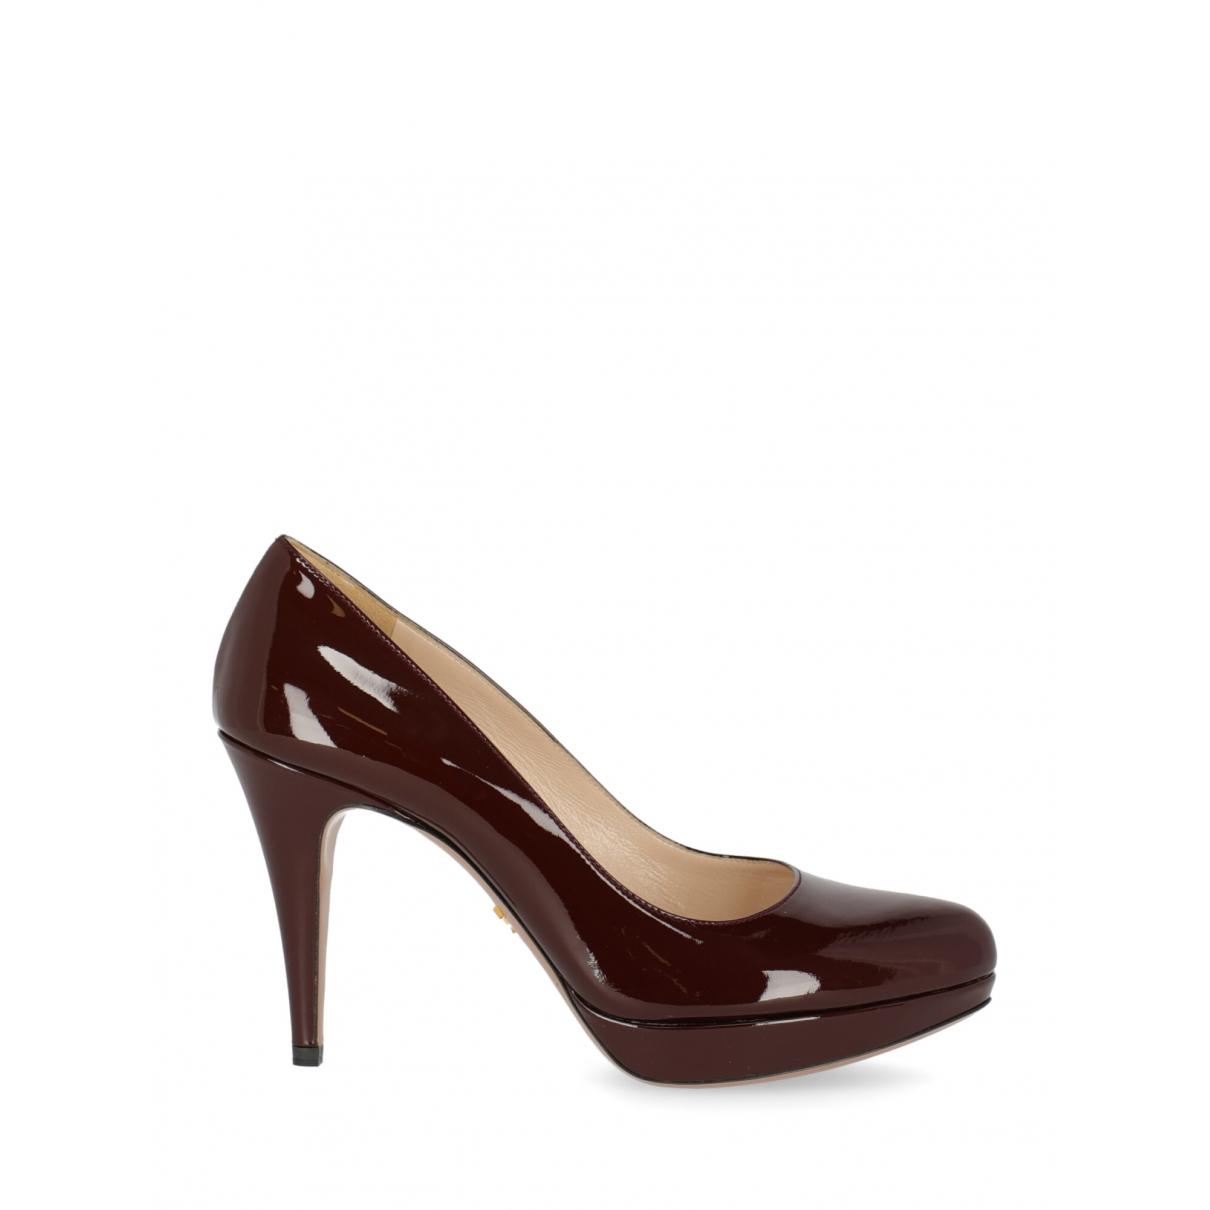 Prada \N Burgundy Patent leather Heels for Women 38.5 IT